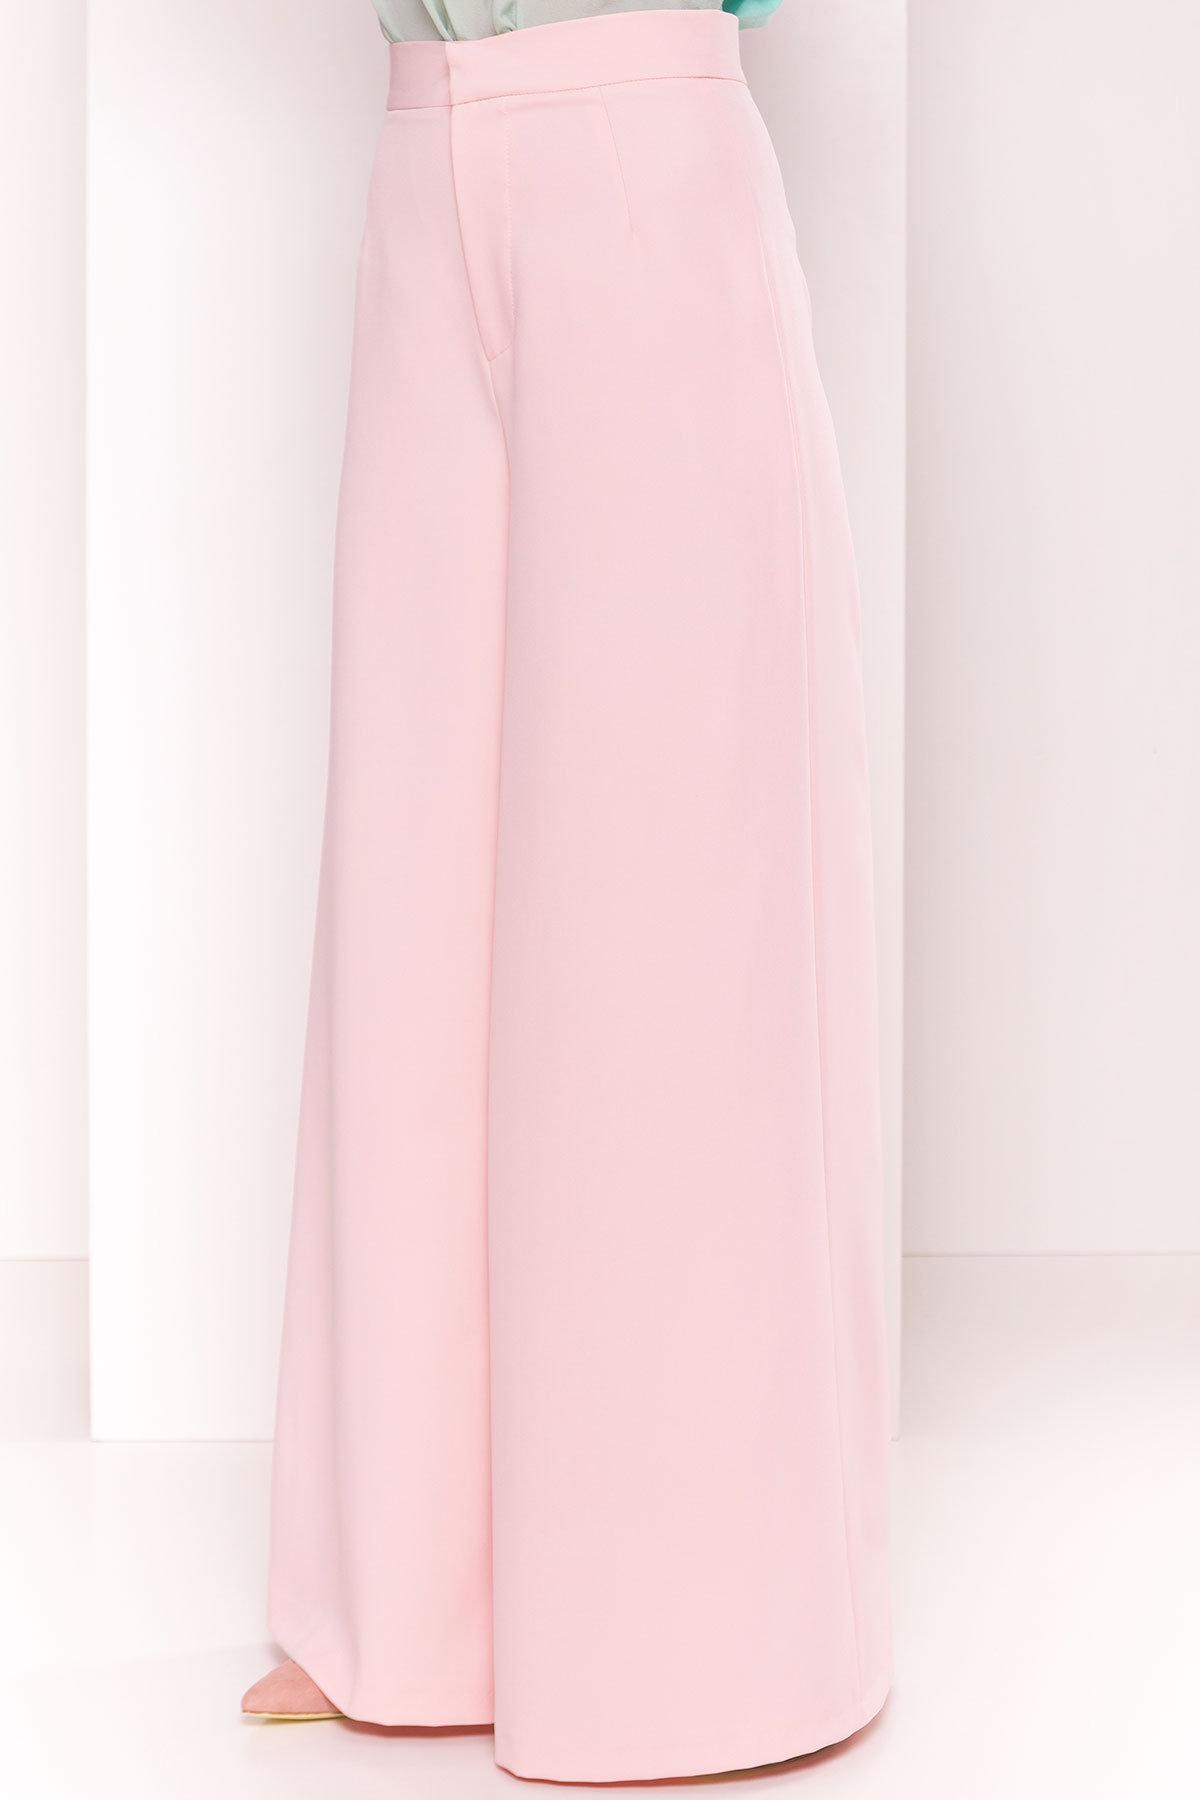 Широкие Брюки Мадлен 2788 АРТ. 34800 Цвет: Розовый - фото 4, интернет магазин tm-modus.ru